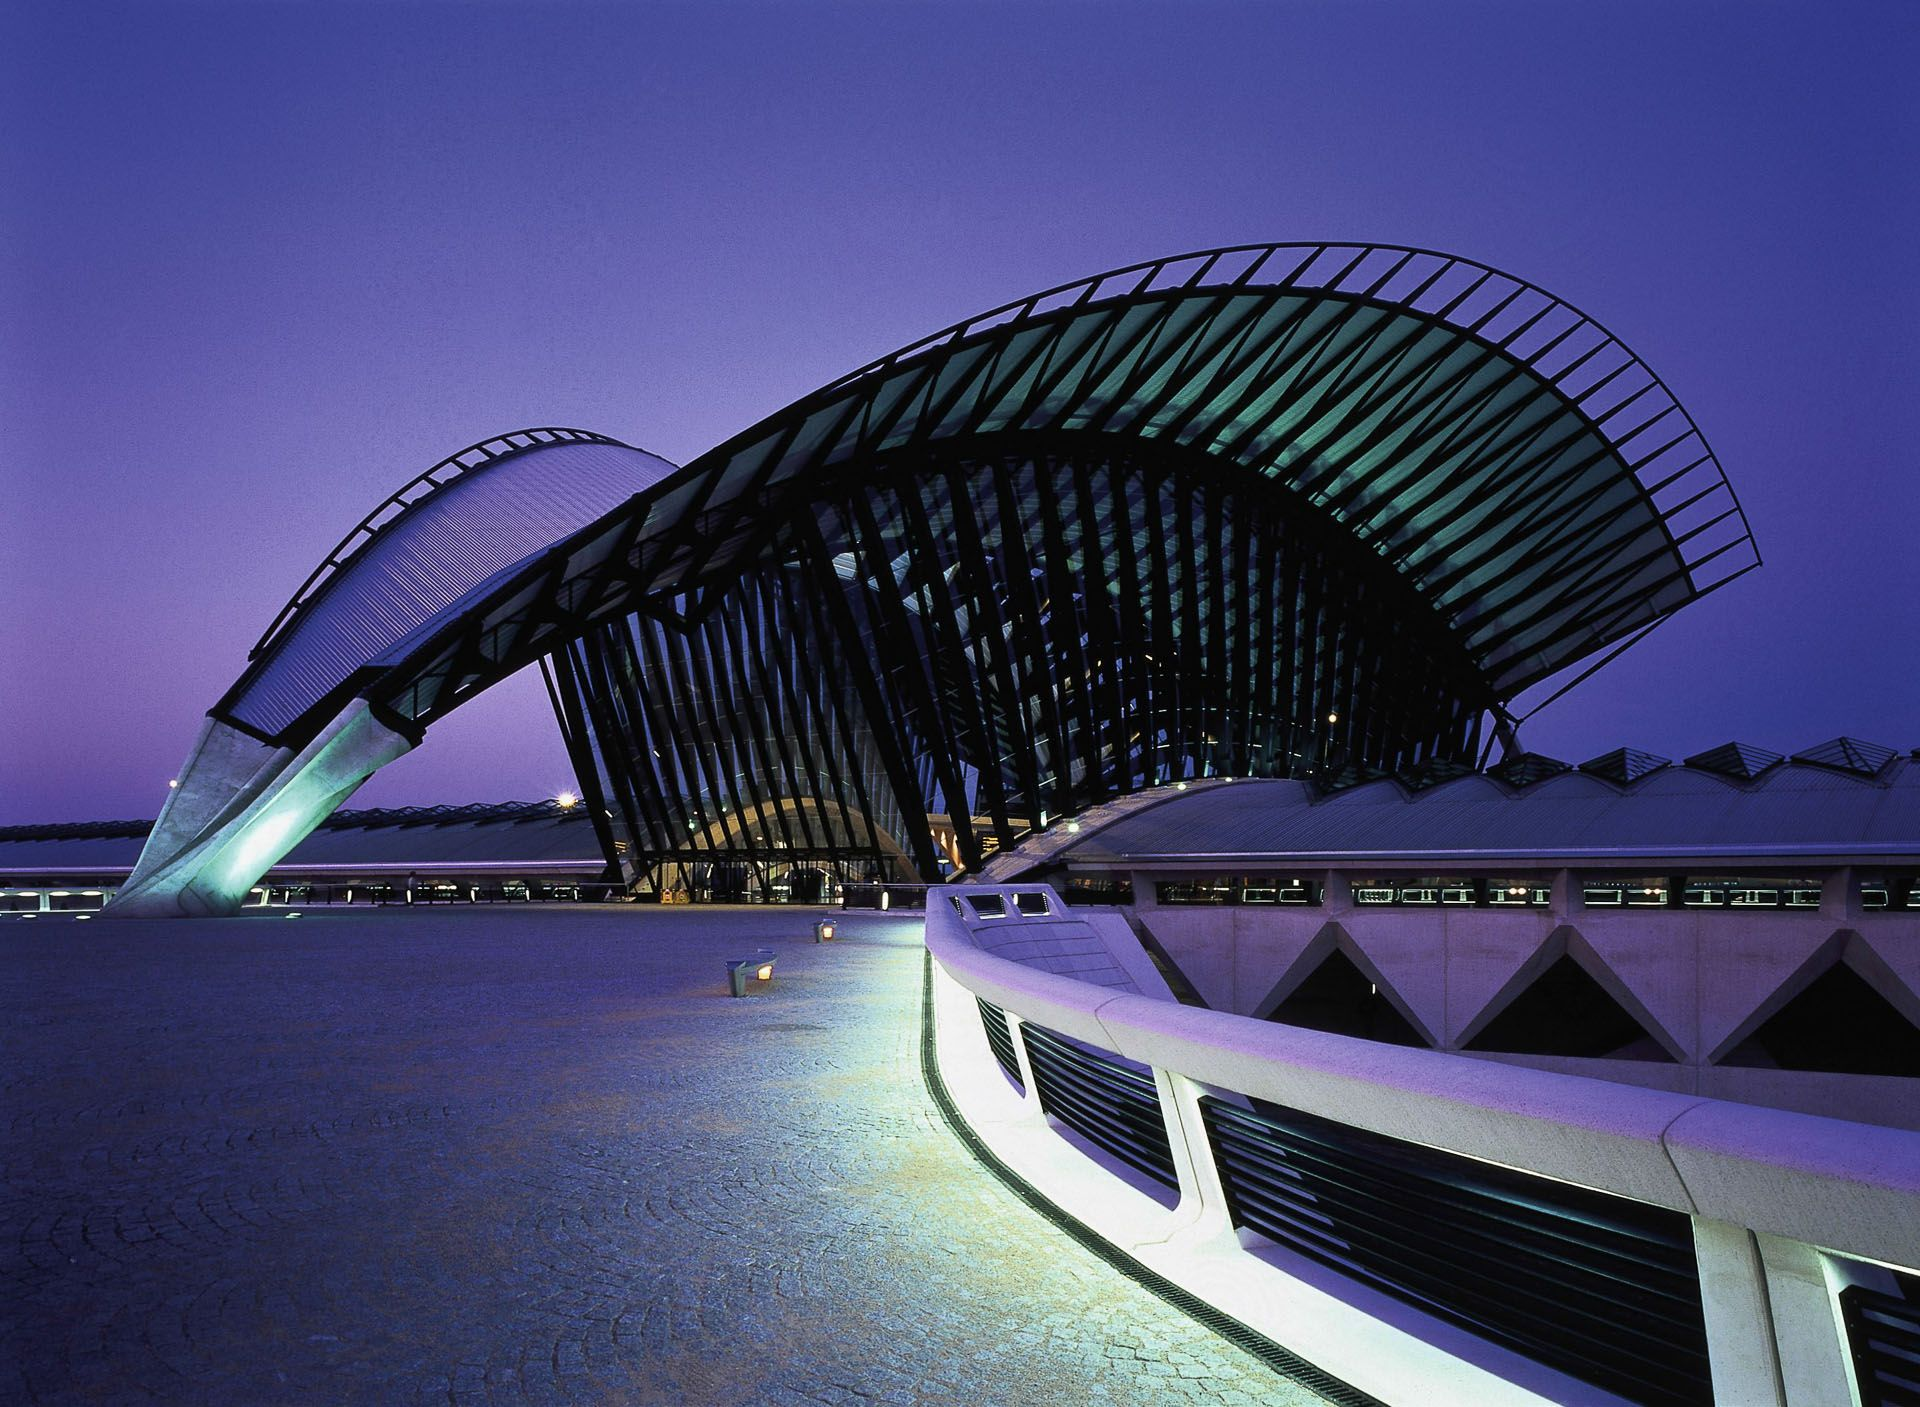 Lyon Saint Exupery Airport Railway Station Colombier Saugnieu Santiago Calatrava Santiago Calatrava Santiago Architecture